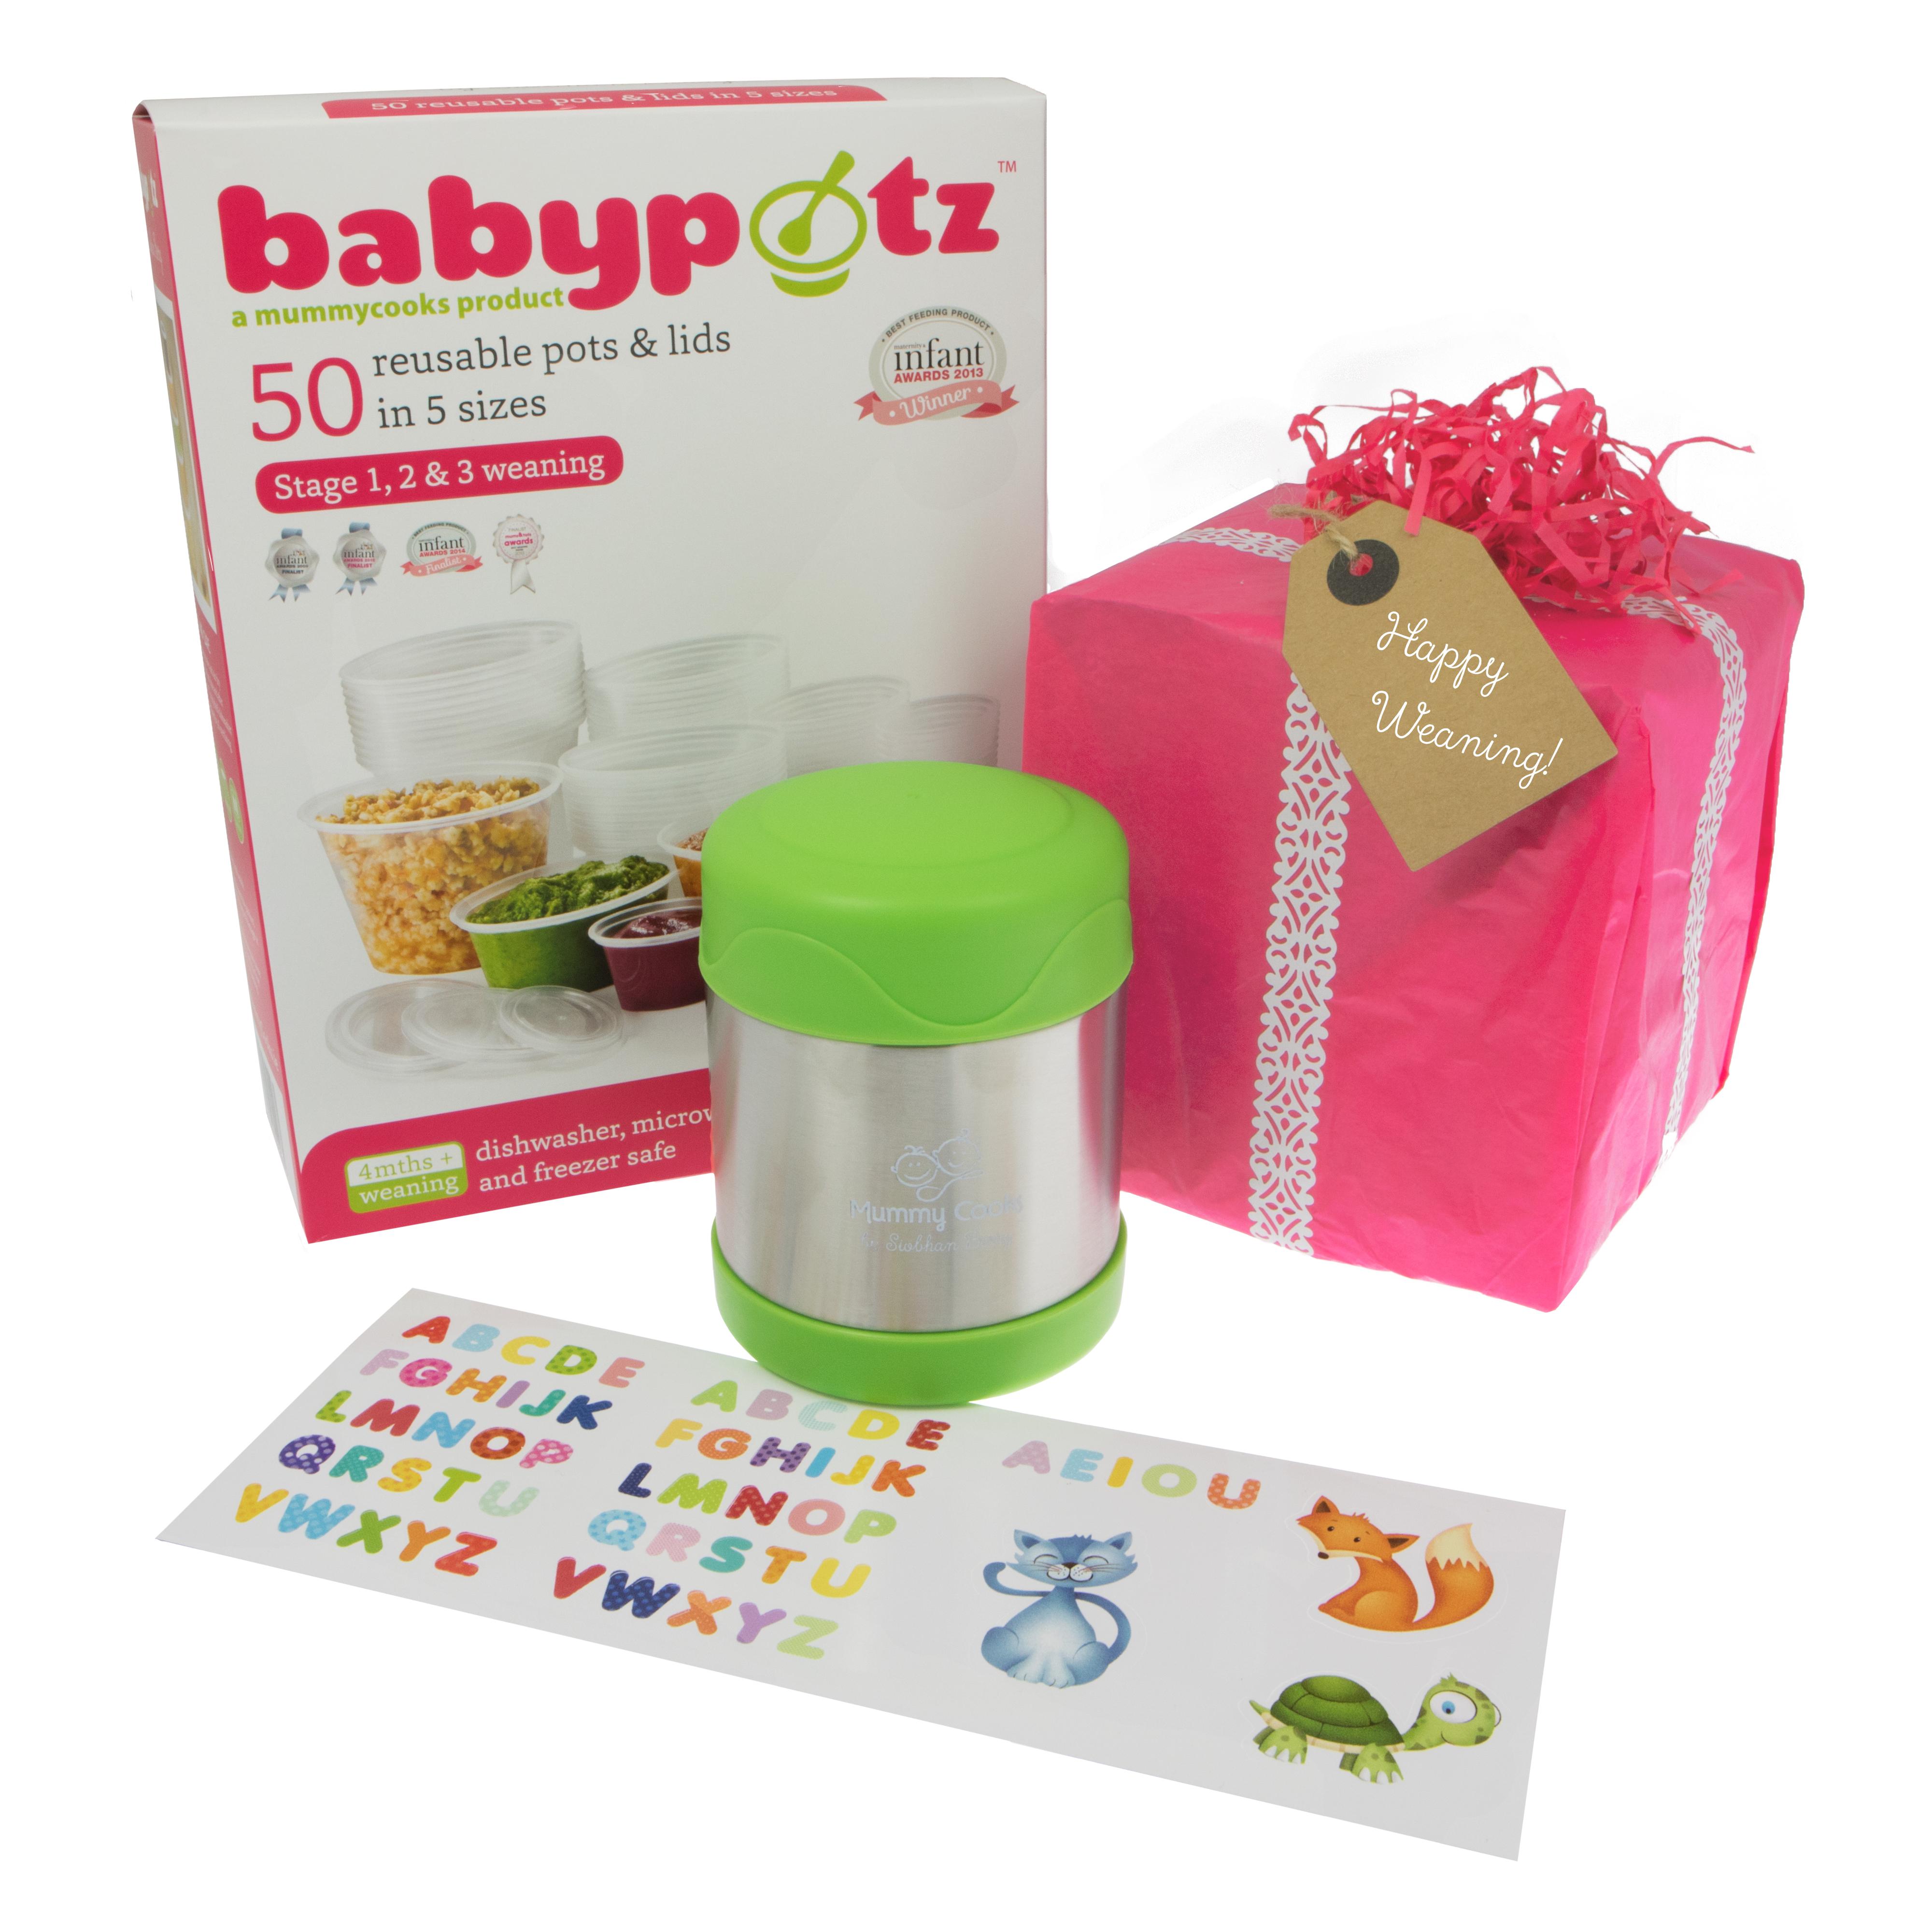 Mummy Cooks: Starter Weaning Gift Set